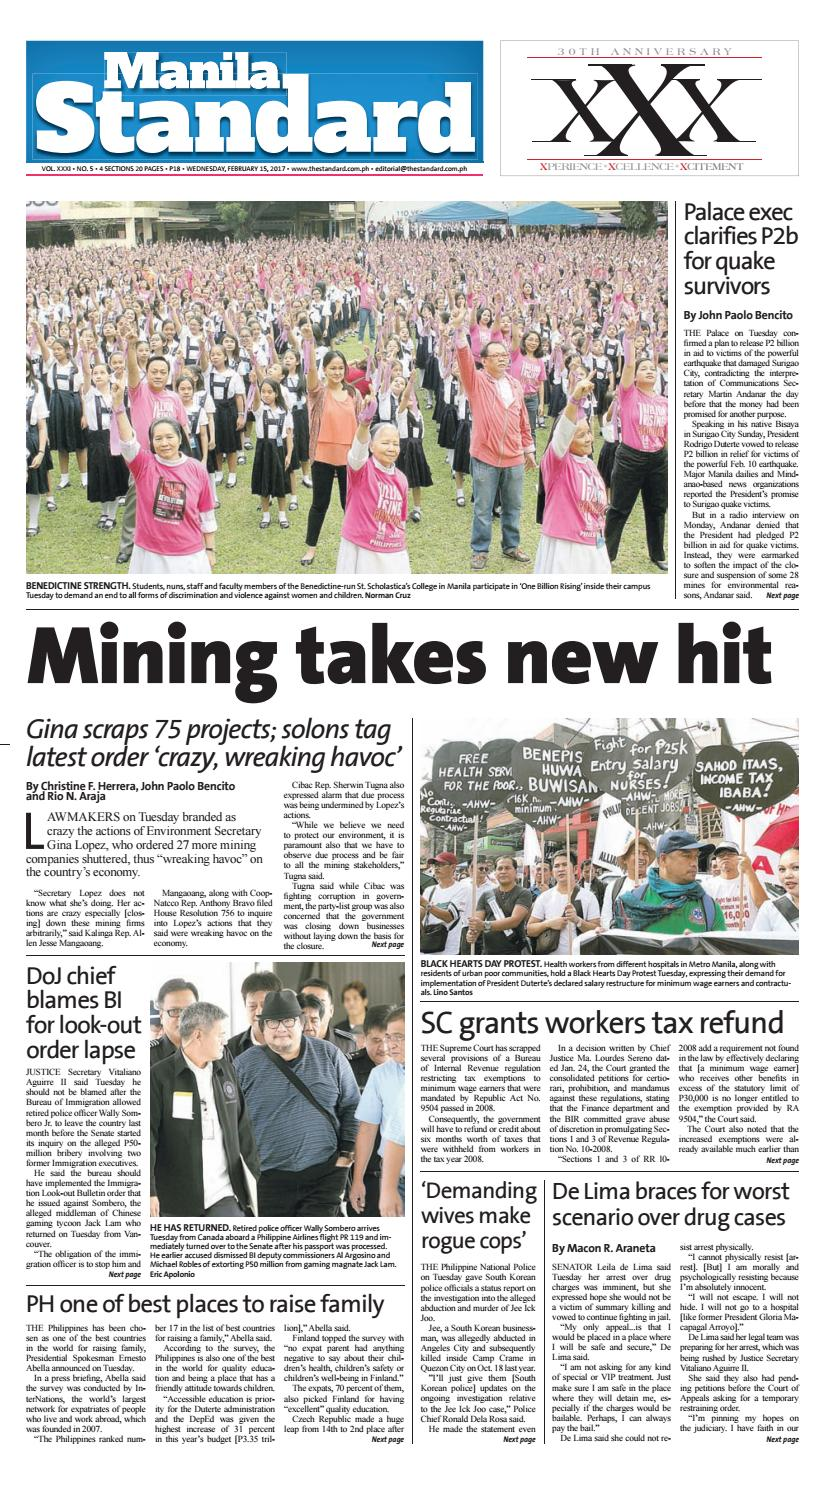 Manila Standard - 2017 February 15 - Wednesday by Manila Standard